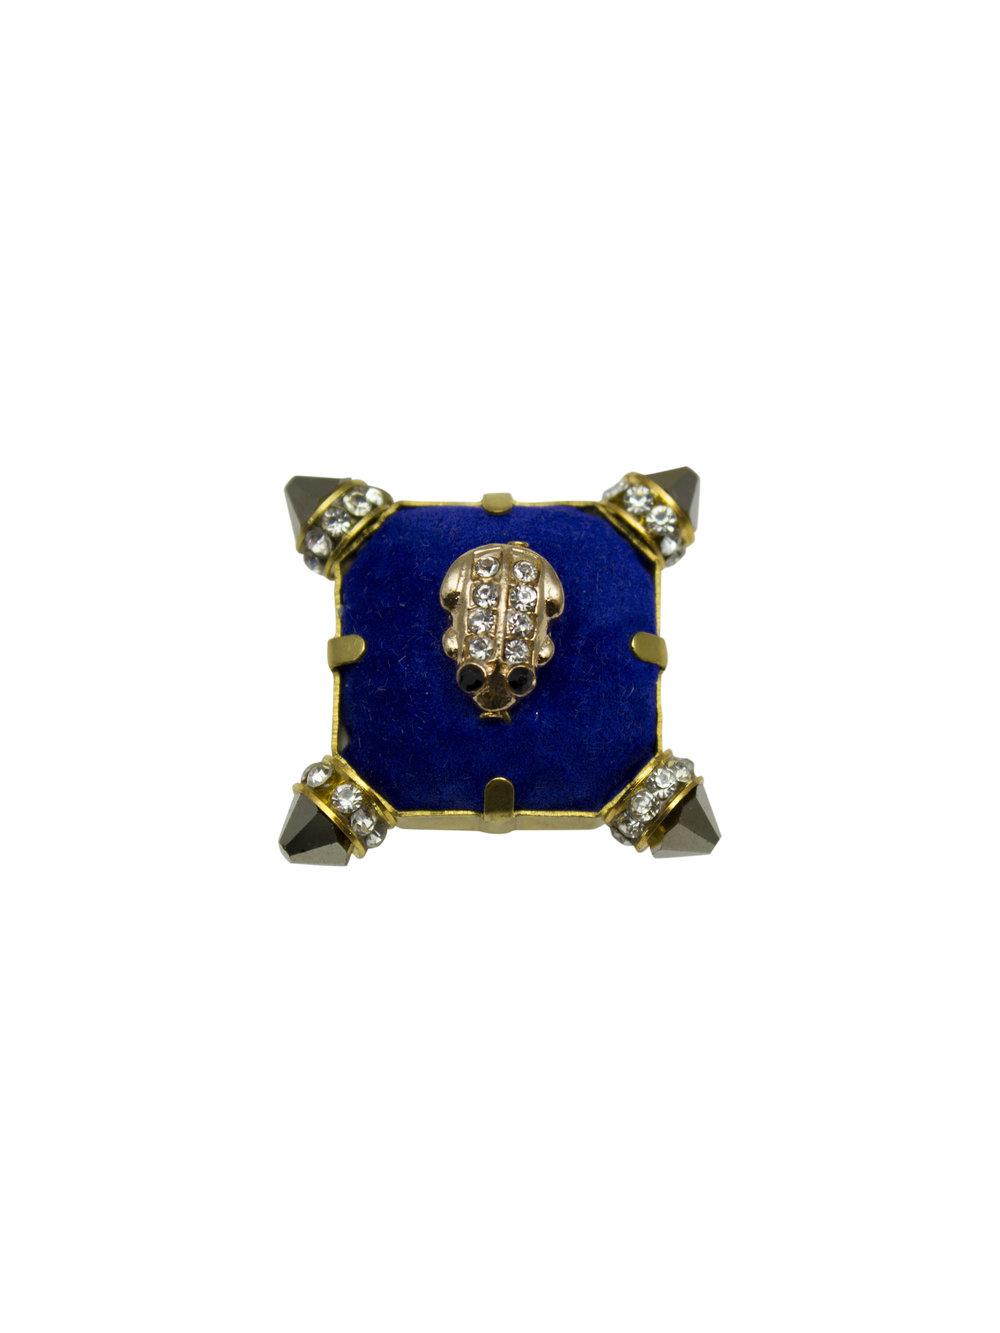 243R Blue & Gold Military Ring (1).jpg